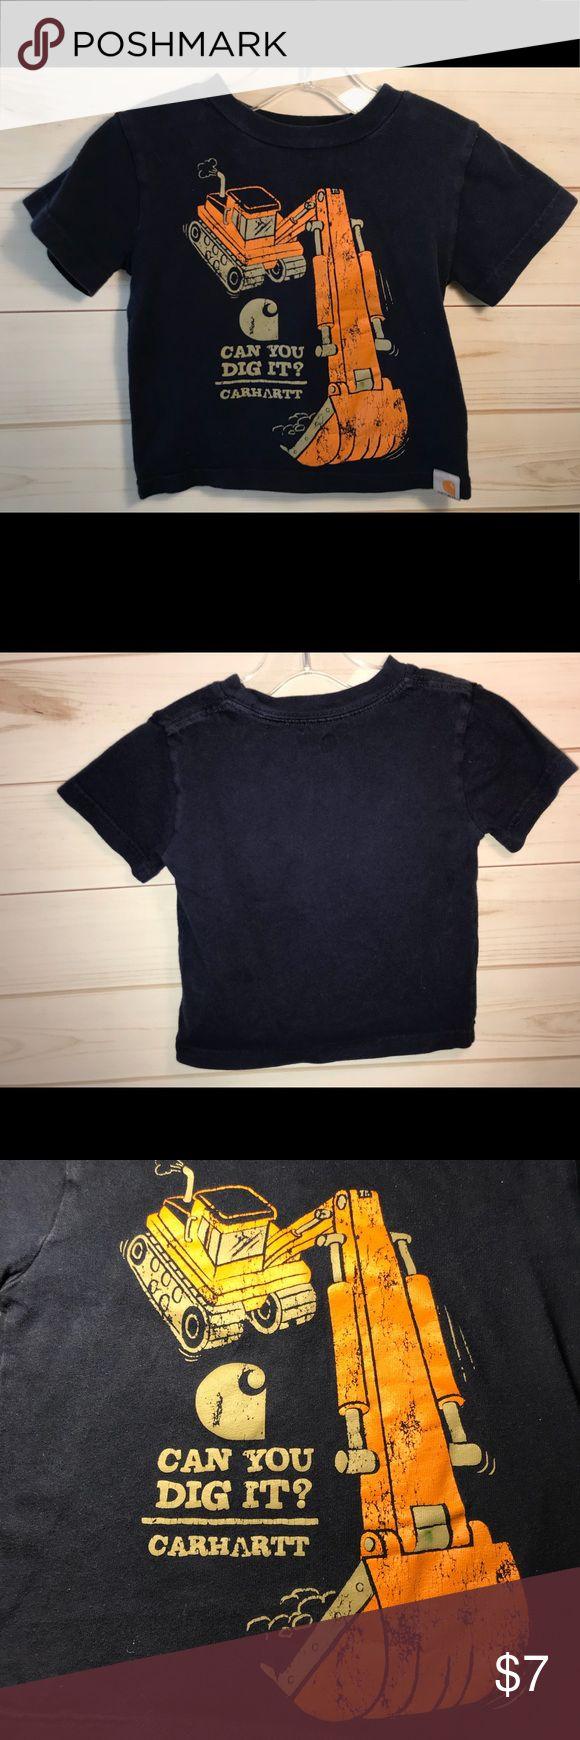 "Carhartt T-Shirt Tractor ""Can you dig"" Carhart short sleeve shirt. Color is navy blue. Carhartt Shirts & Tops Tees - Short Sleeve"